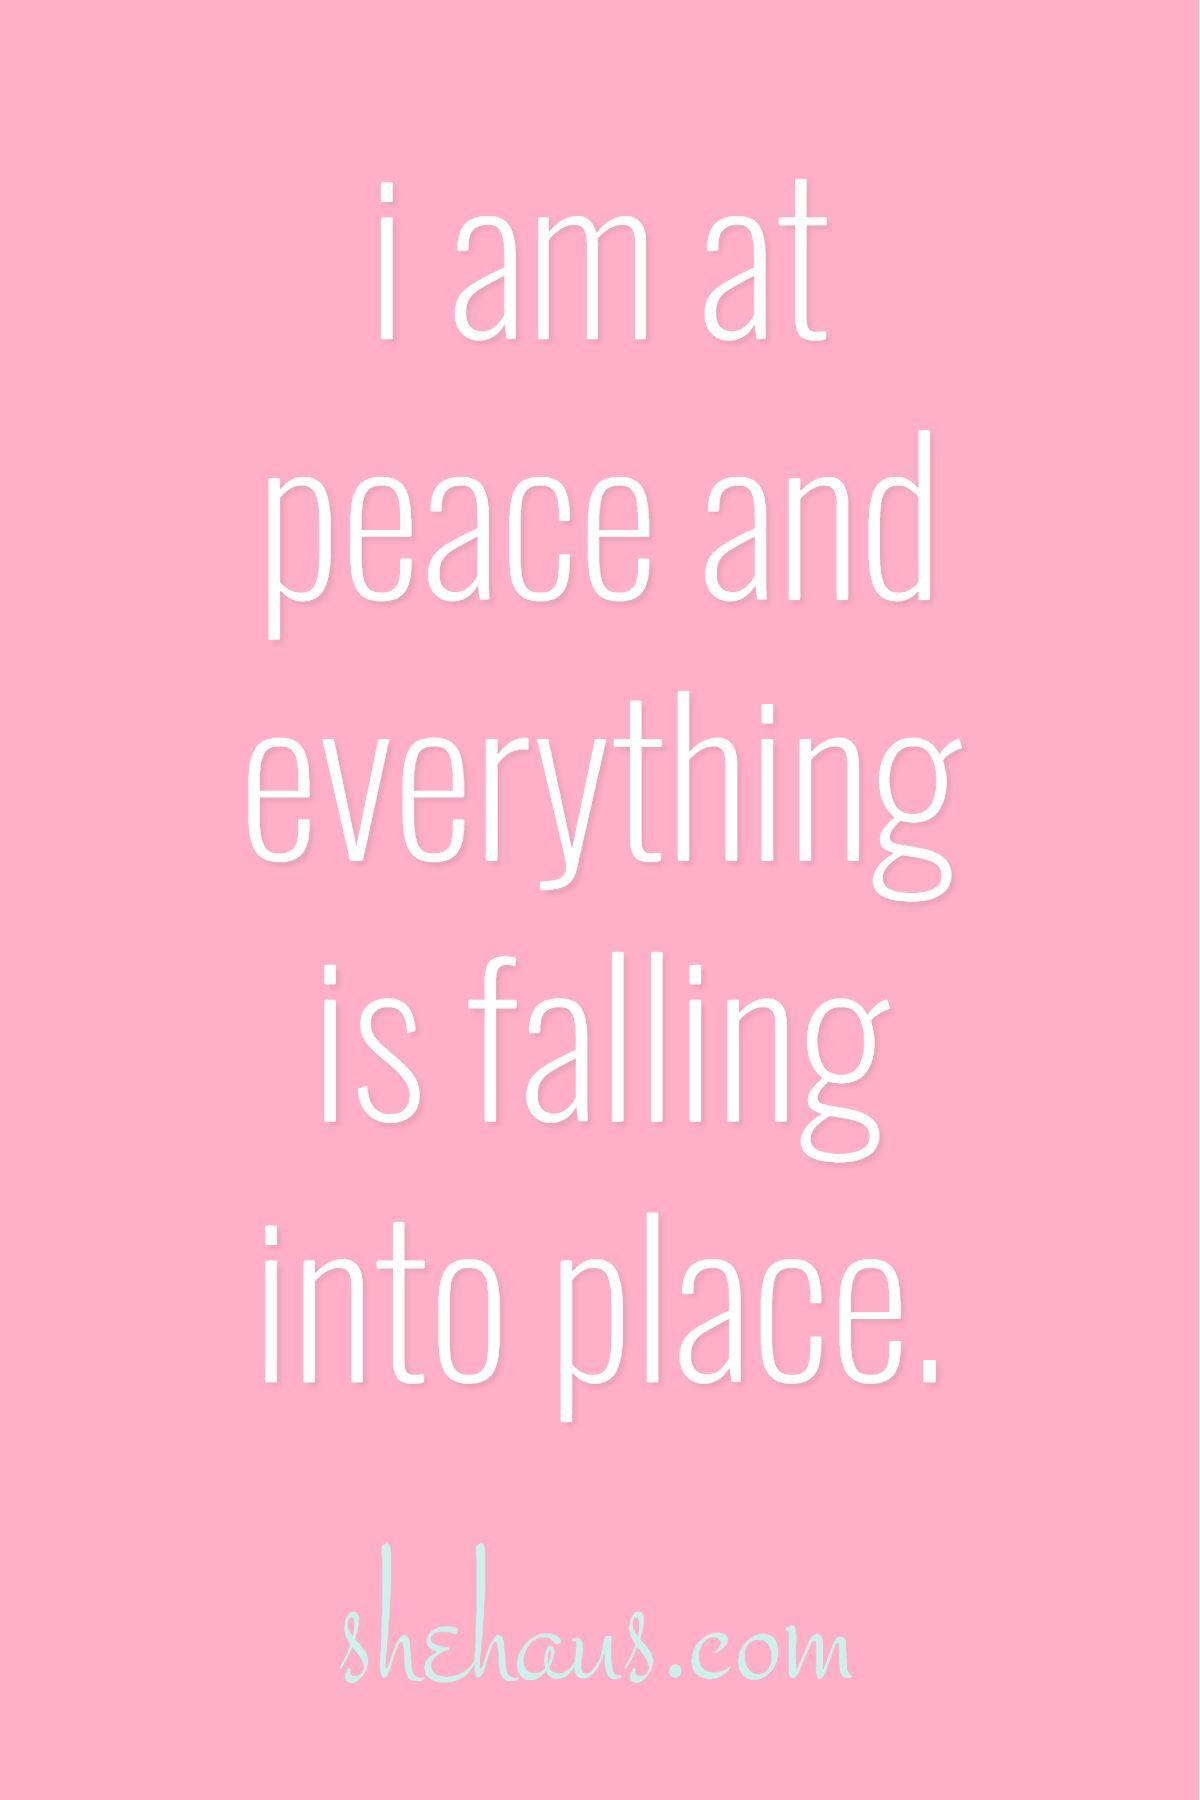 I am at peace